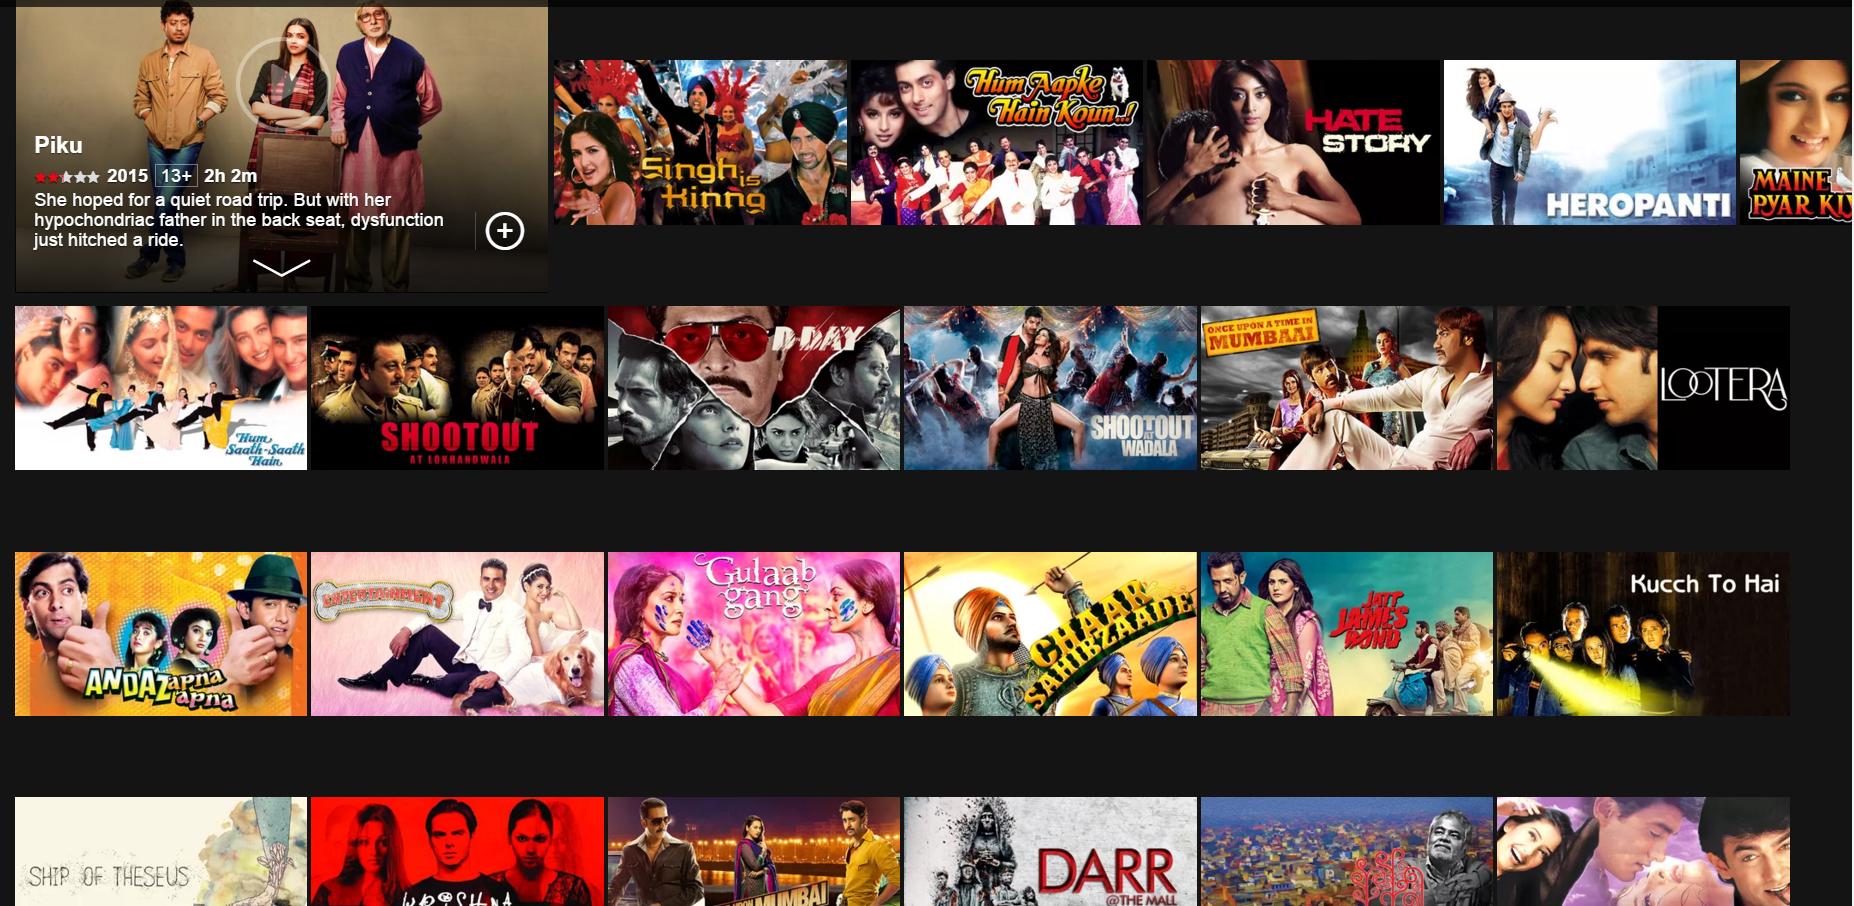 Home | Redflix - Watch Movies & TV Shows Online